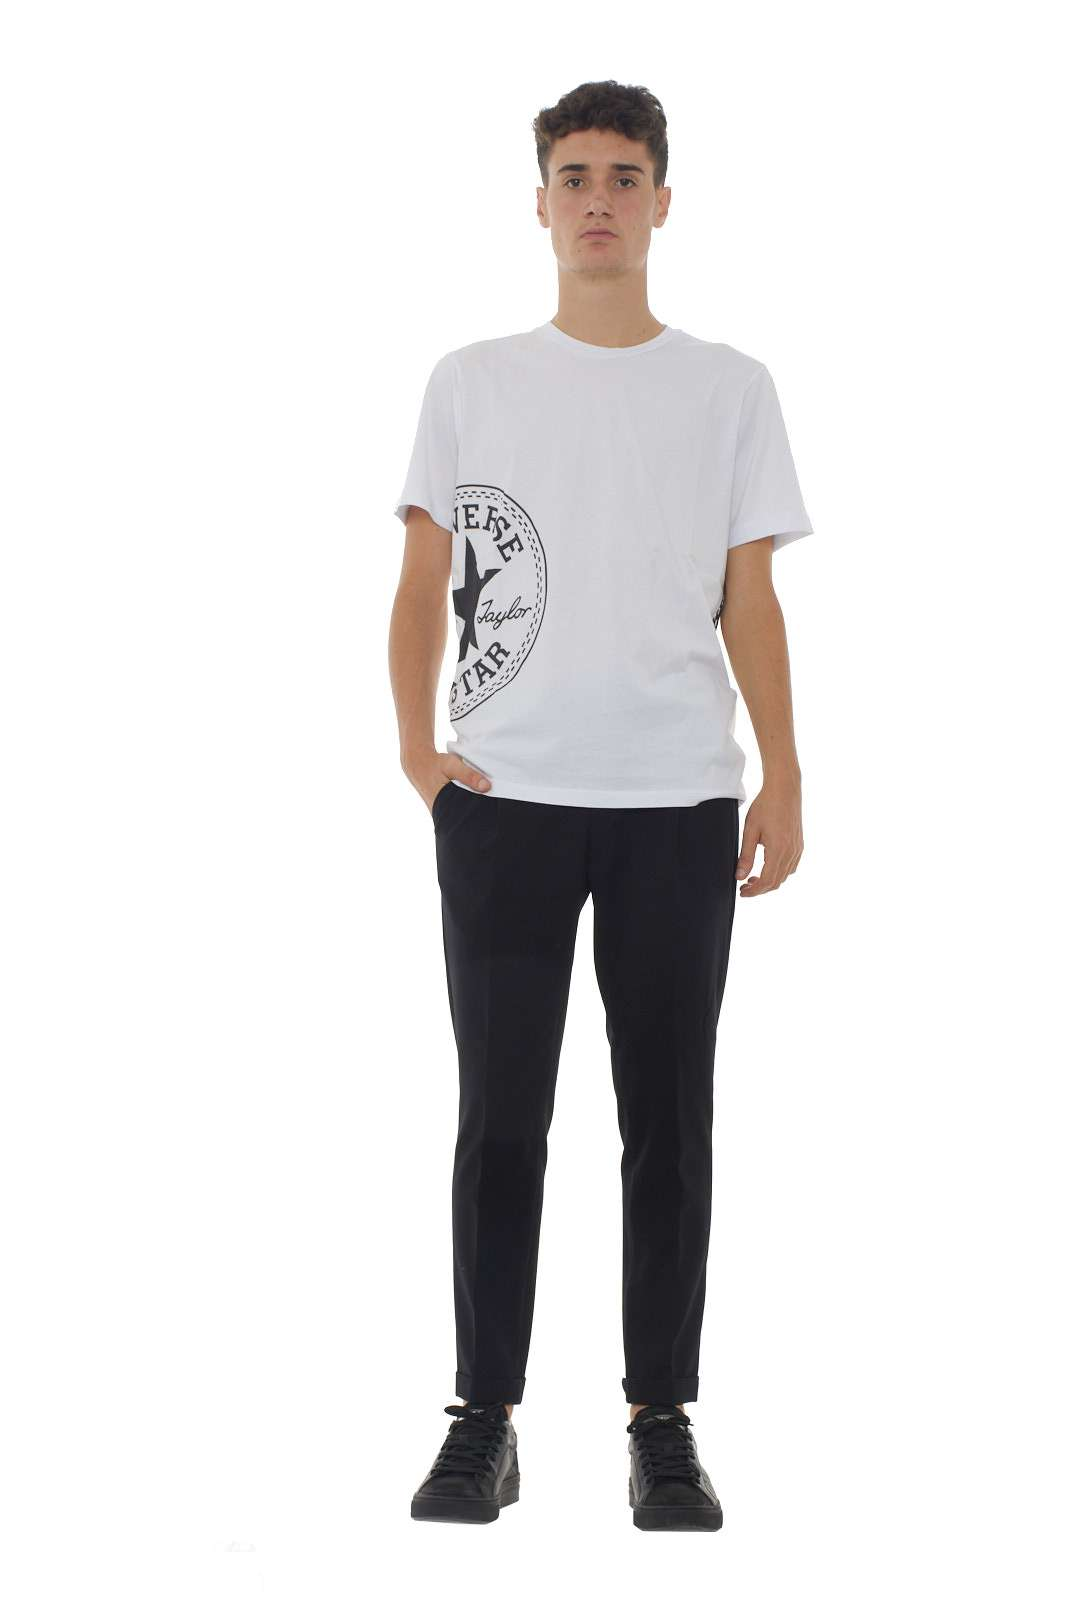 https://www.parmax.com/media/catalog/product/a/i/AI-outlet_parmax-t-shirt-uomo-Converse-10018639-A.jpg